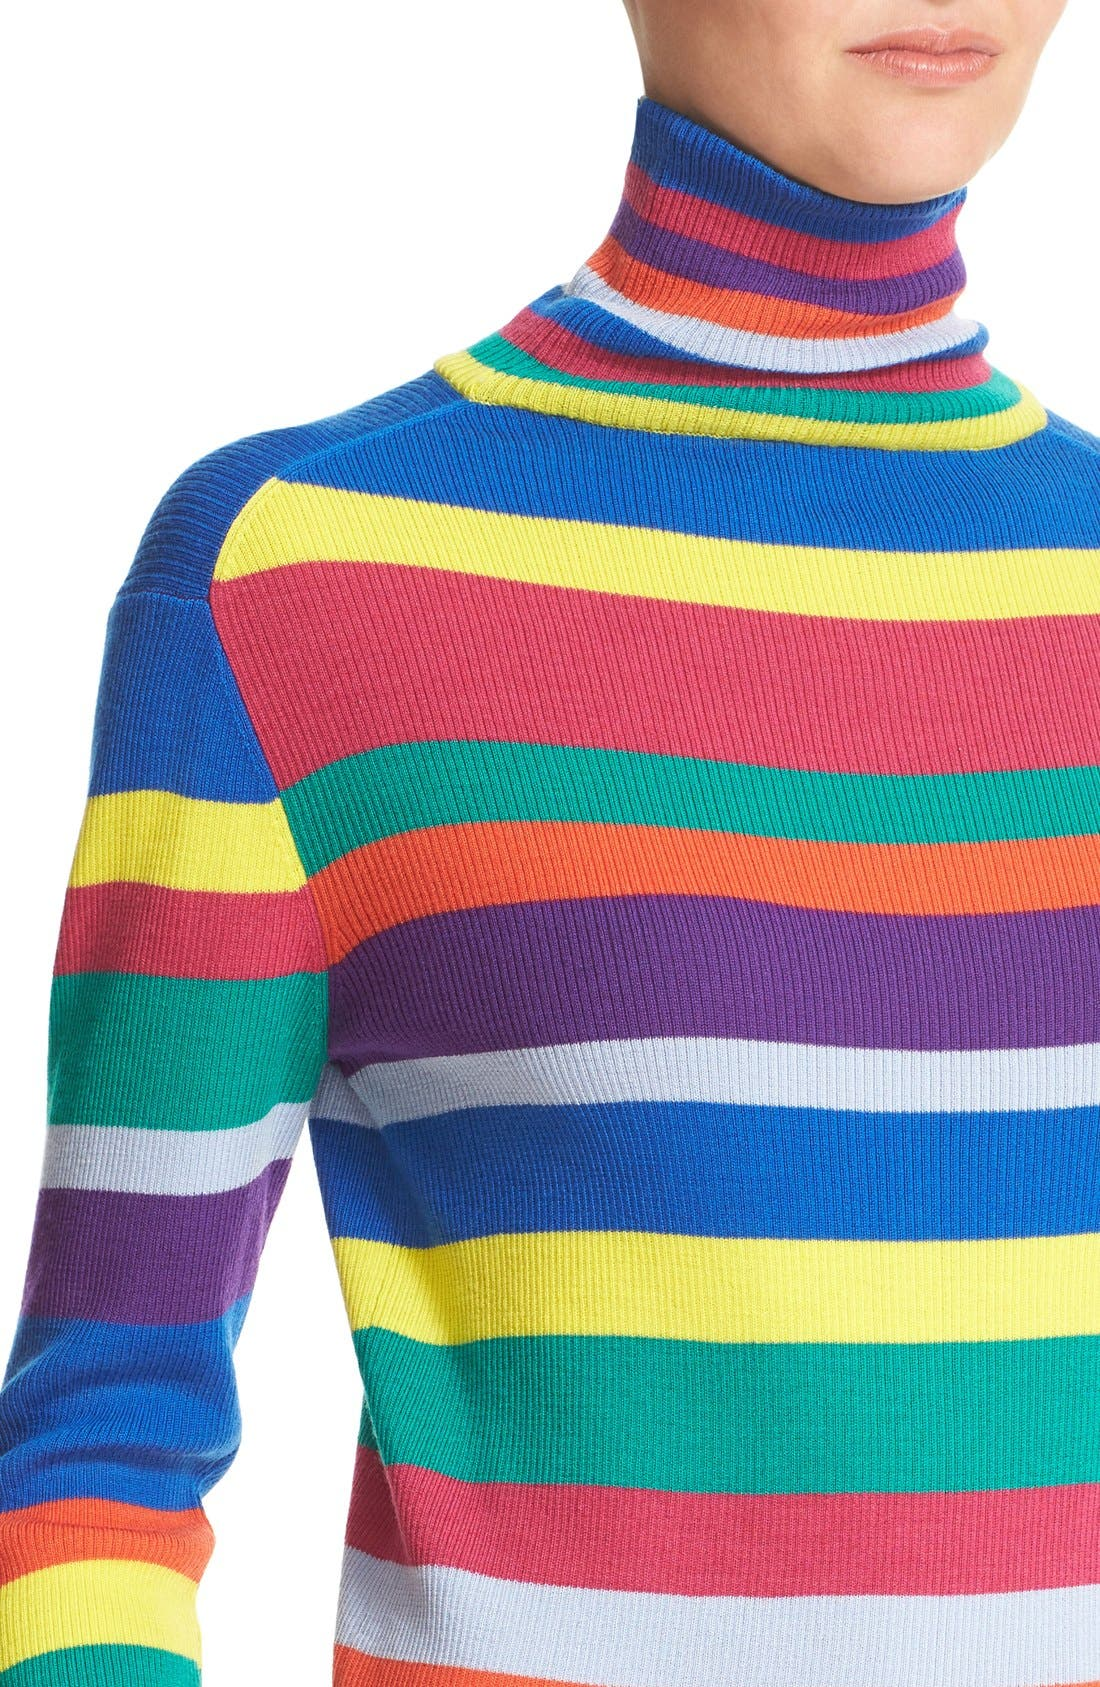 Stripe Merino Wool Turtleneck,                             Alternate thumbnail 2, color,                             960